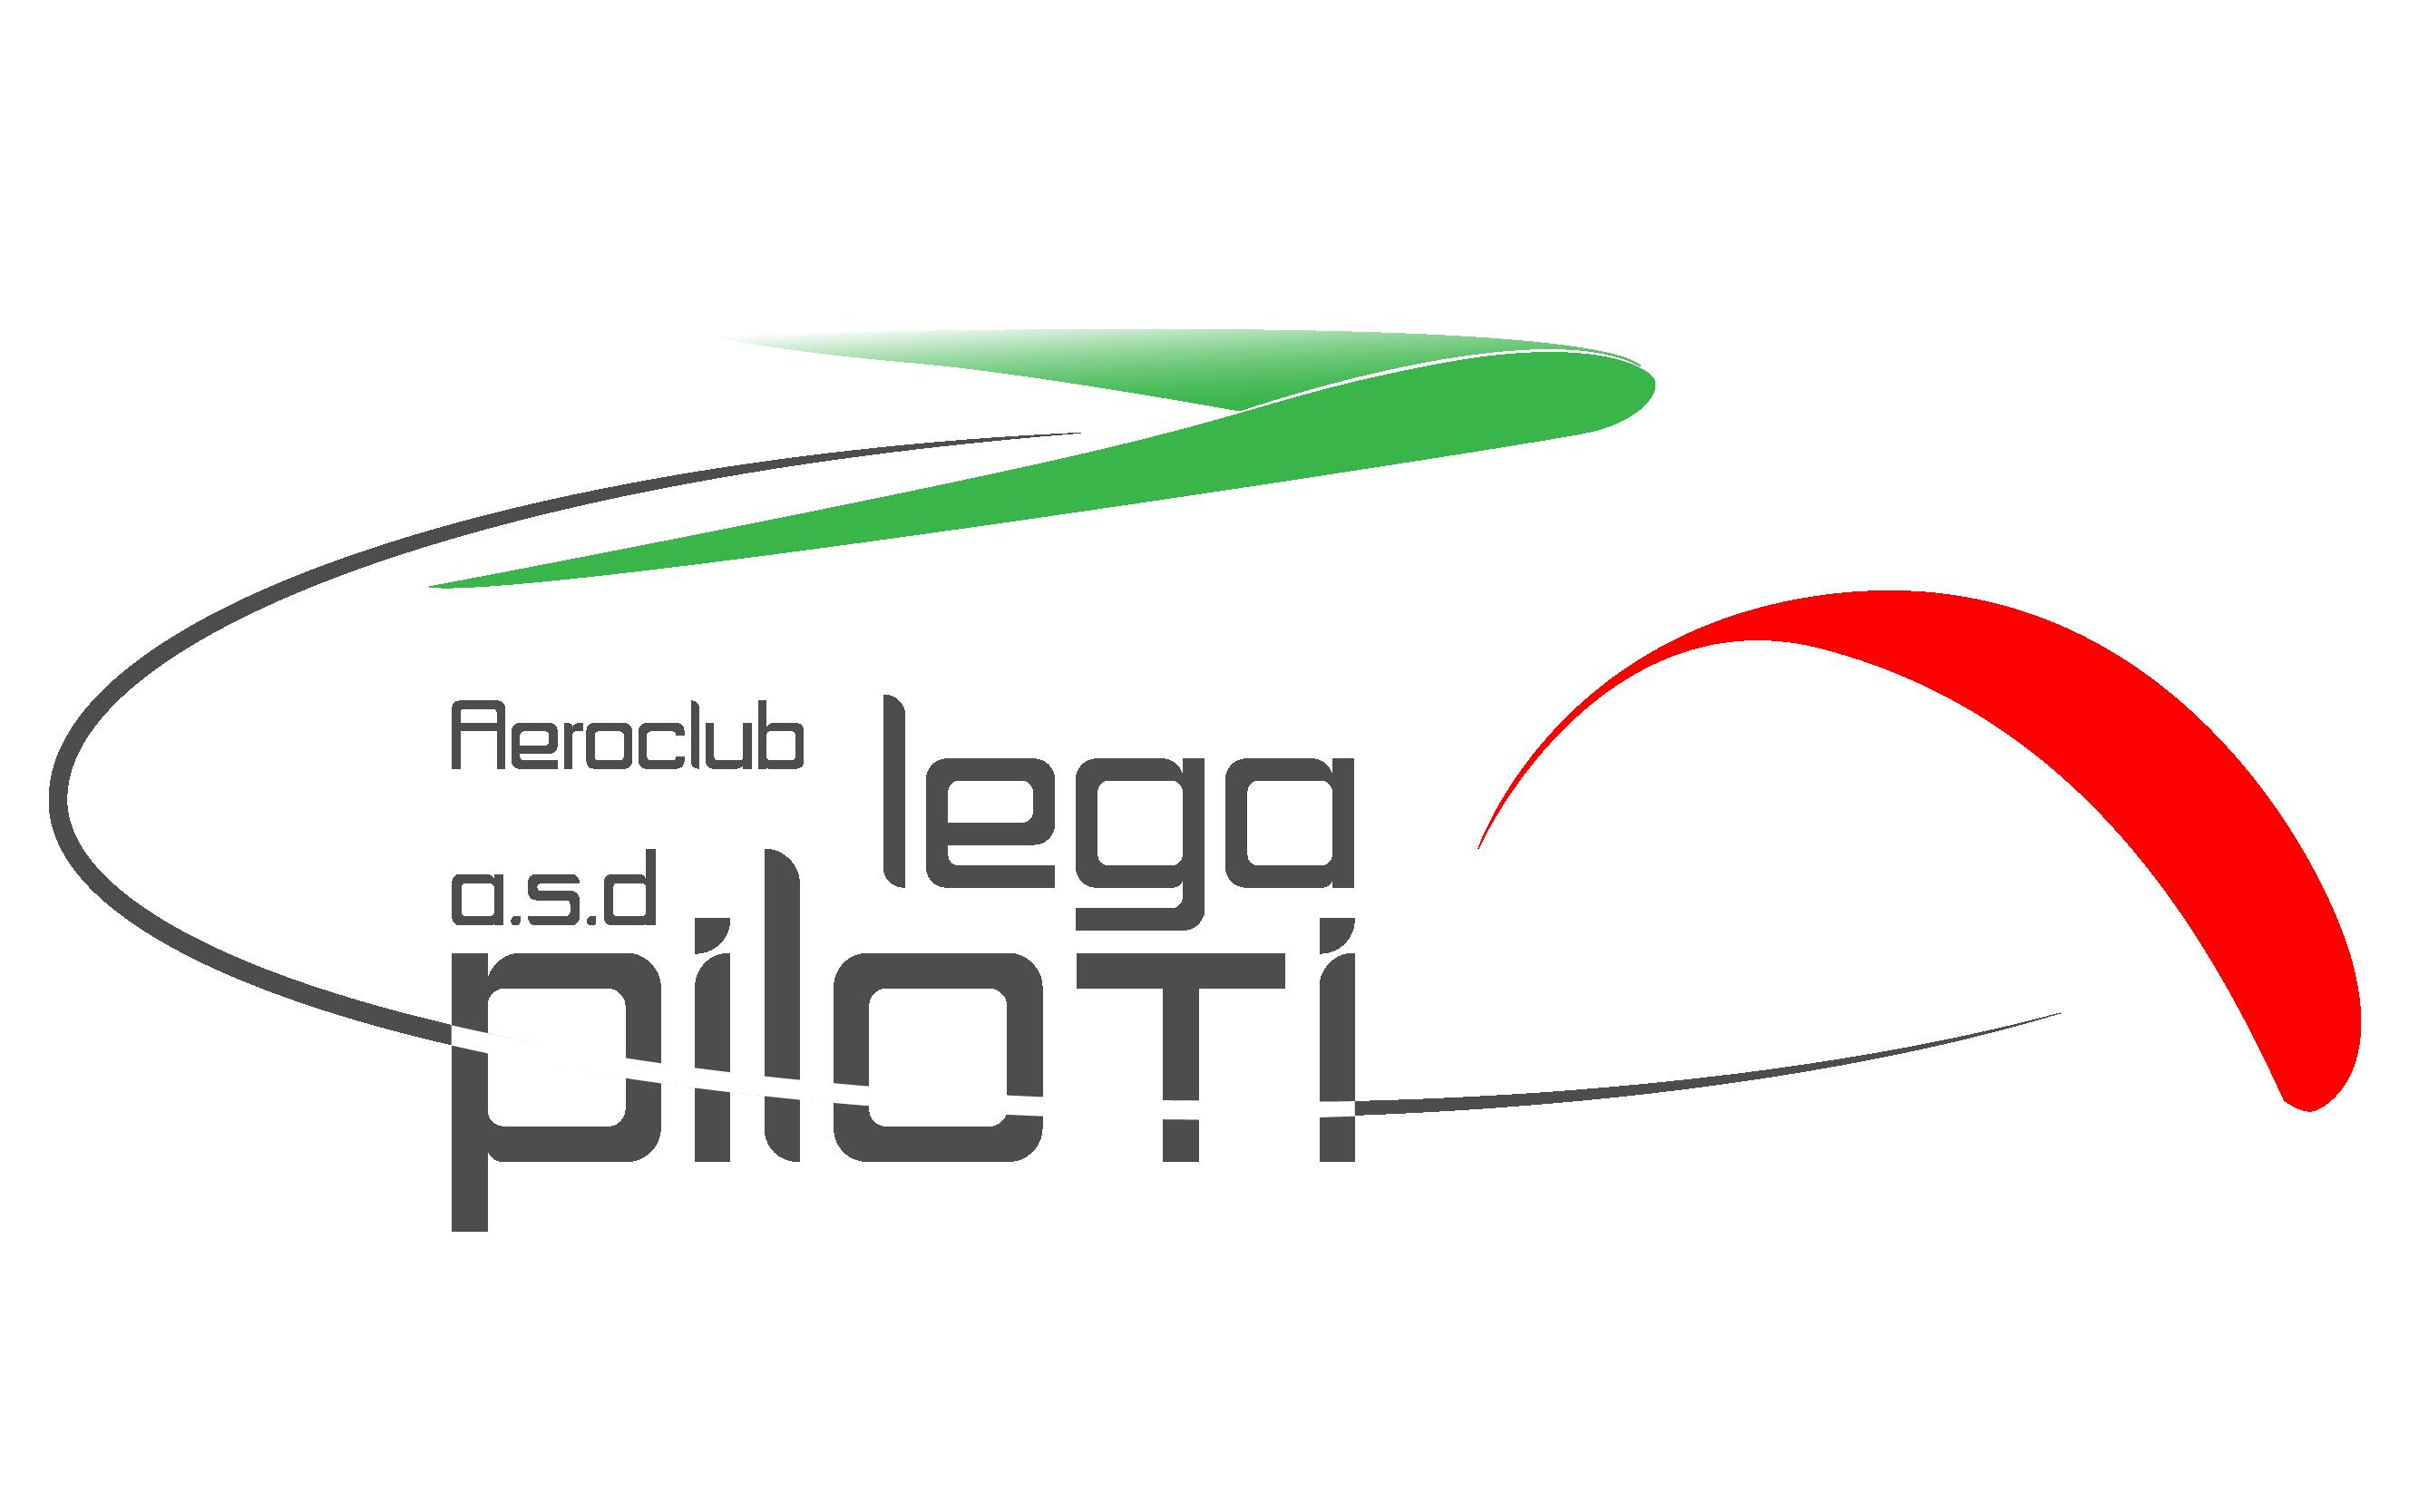 AeC Lega Piloti ASD